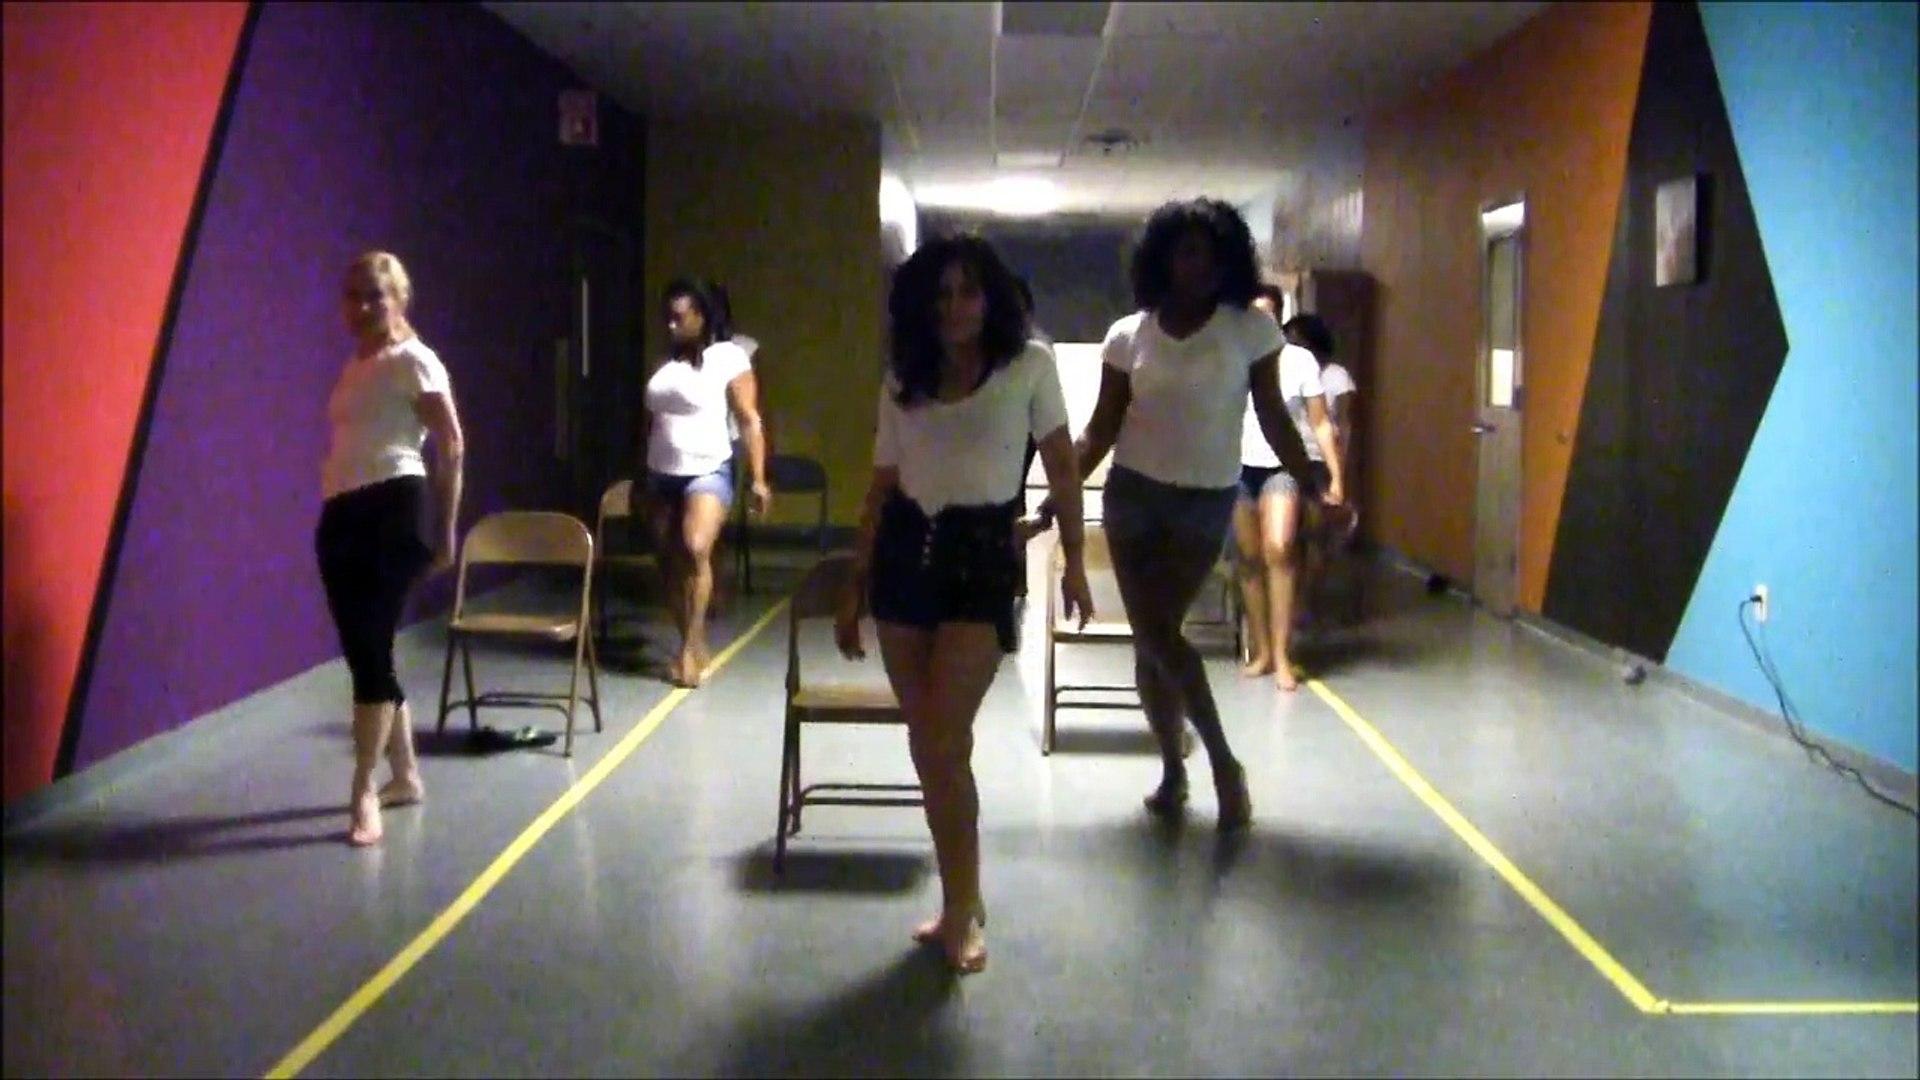 Burlesque Routine - Dance - Saucy routine!